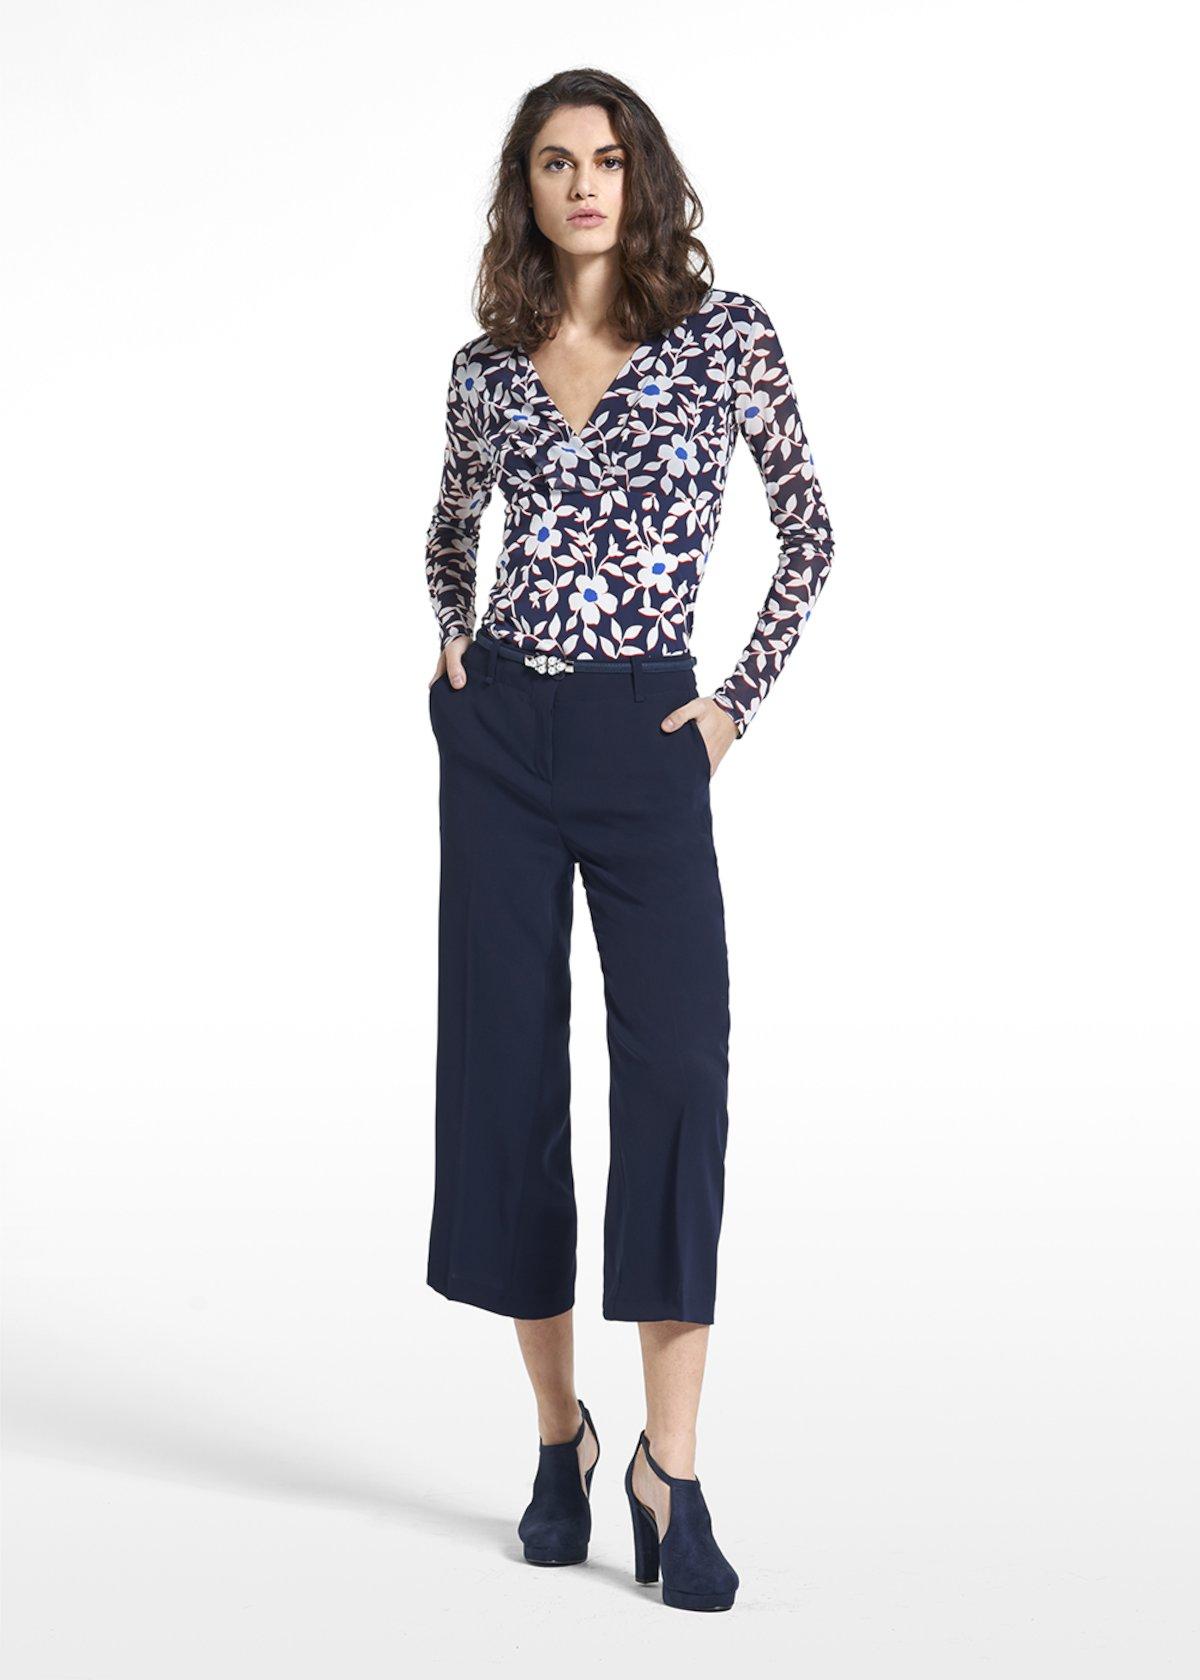 T-shirt Samanta a manica lunga - Blue / White Fantasia - Donna